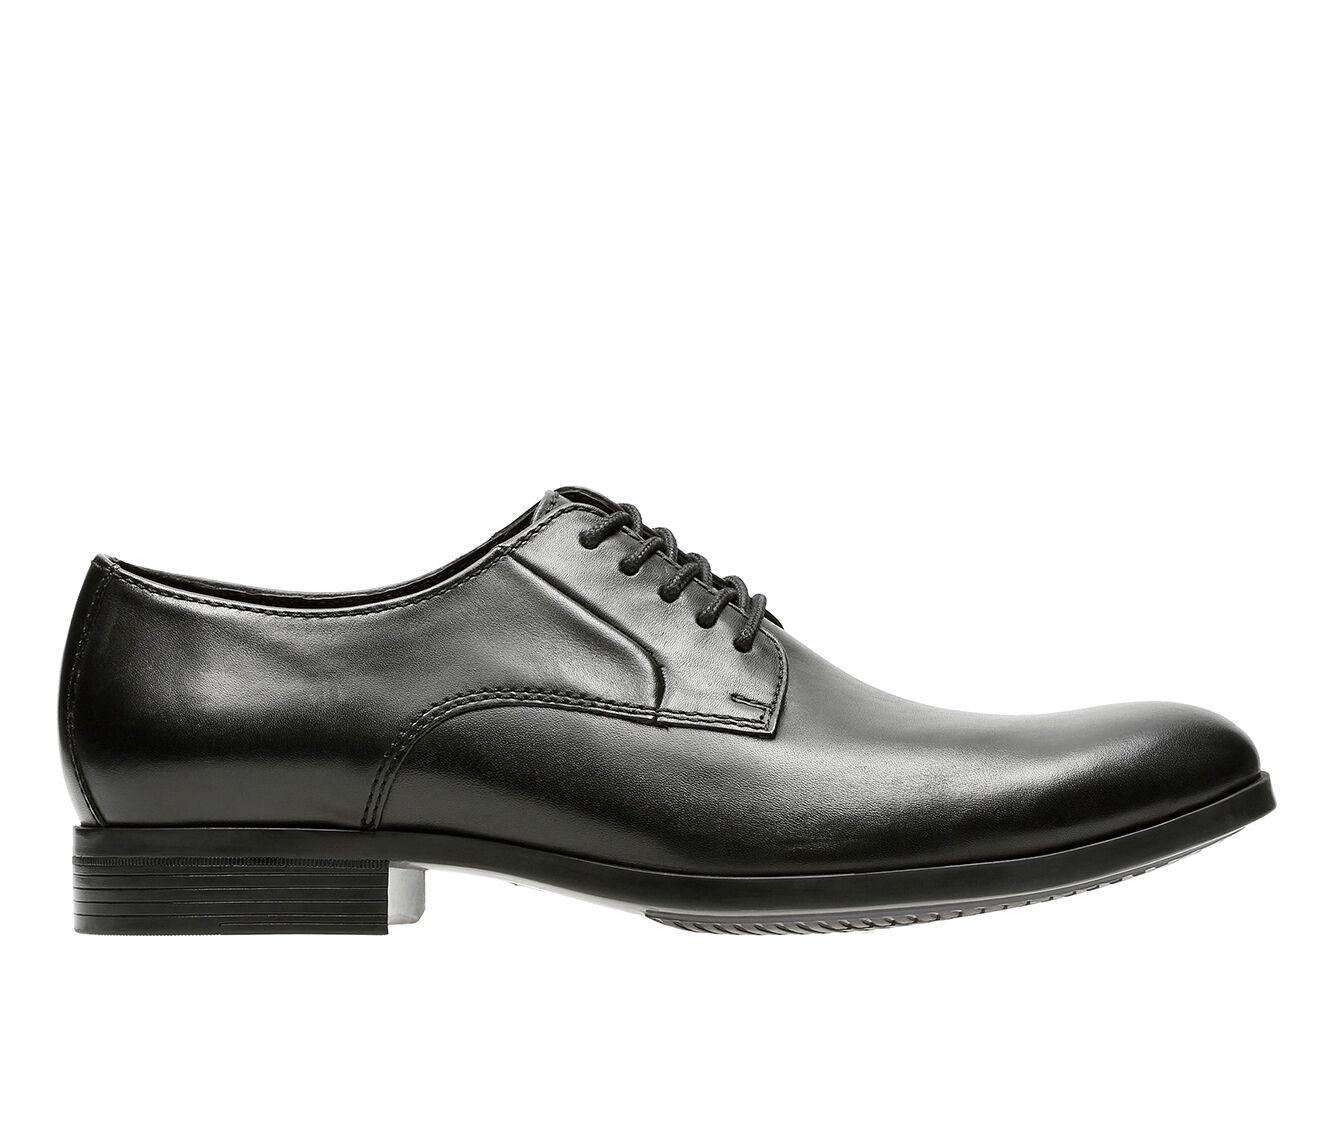 Best Selling Men's Clarks Conwell Plain Dress Shoes Black